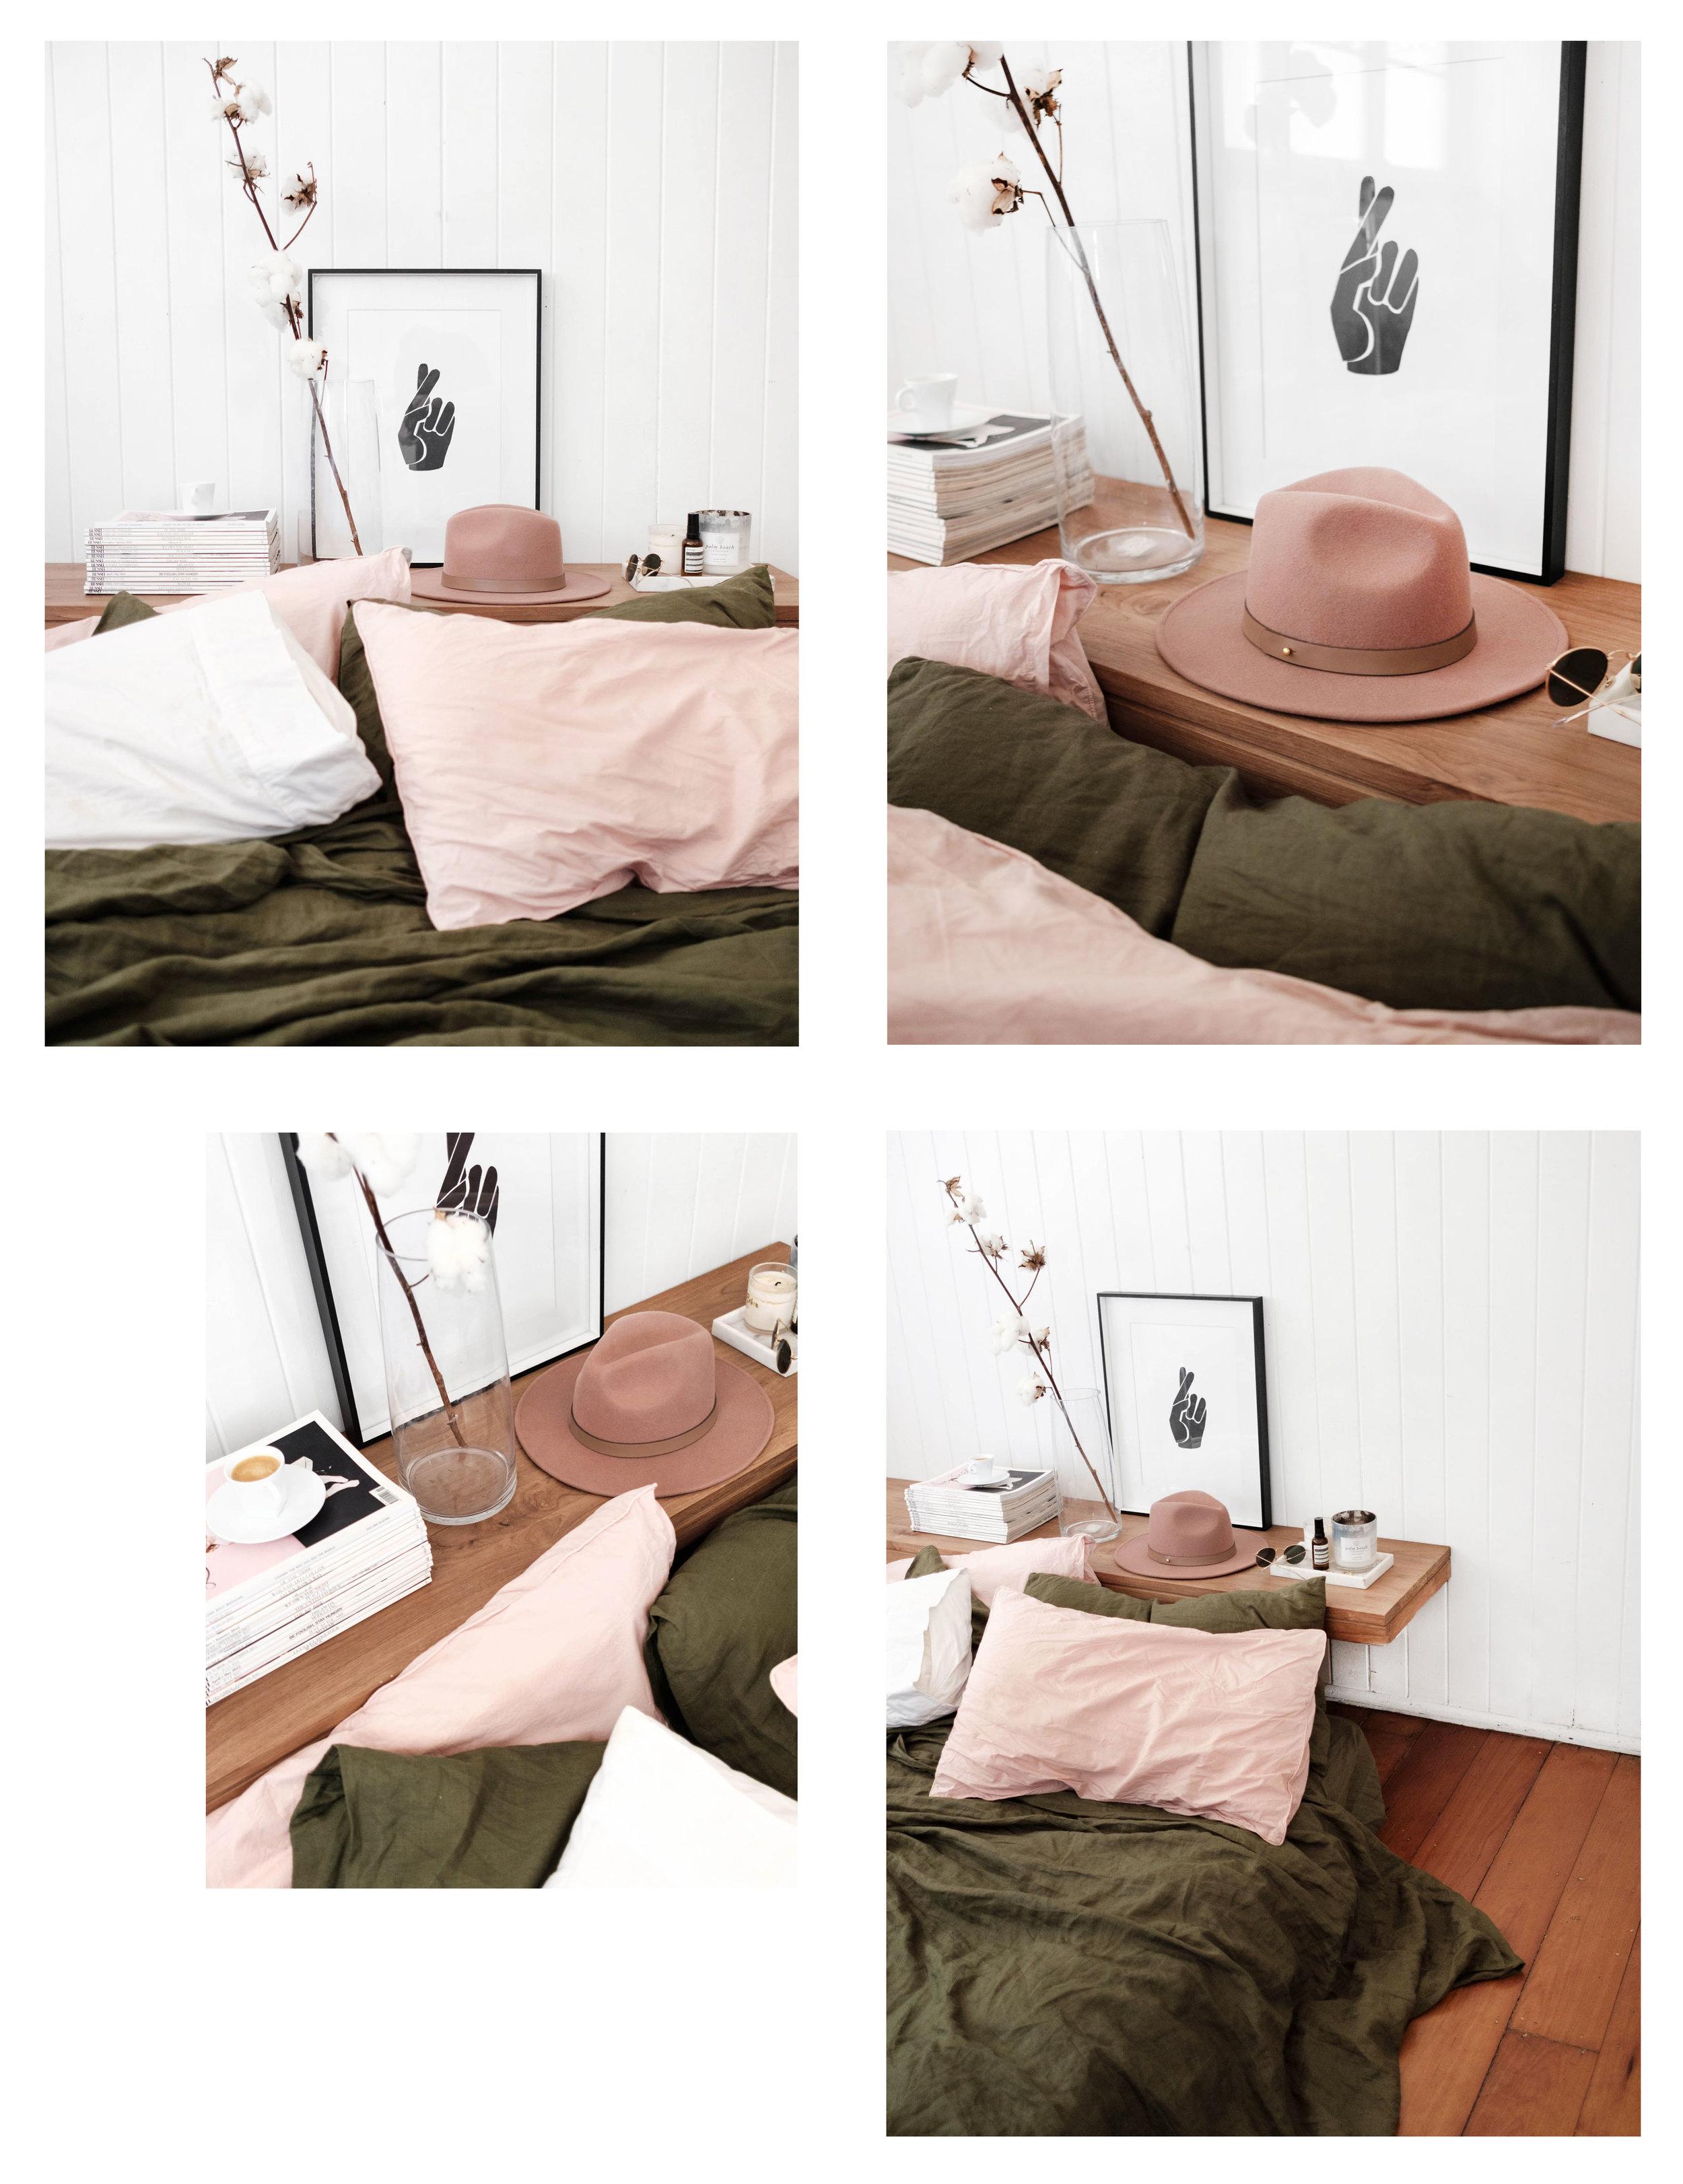 BedroomBench_2.jpg